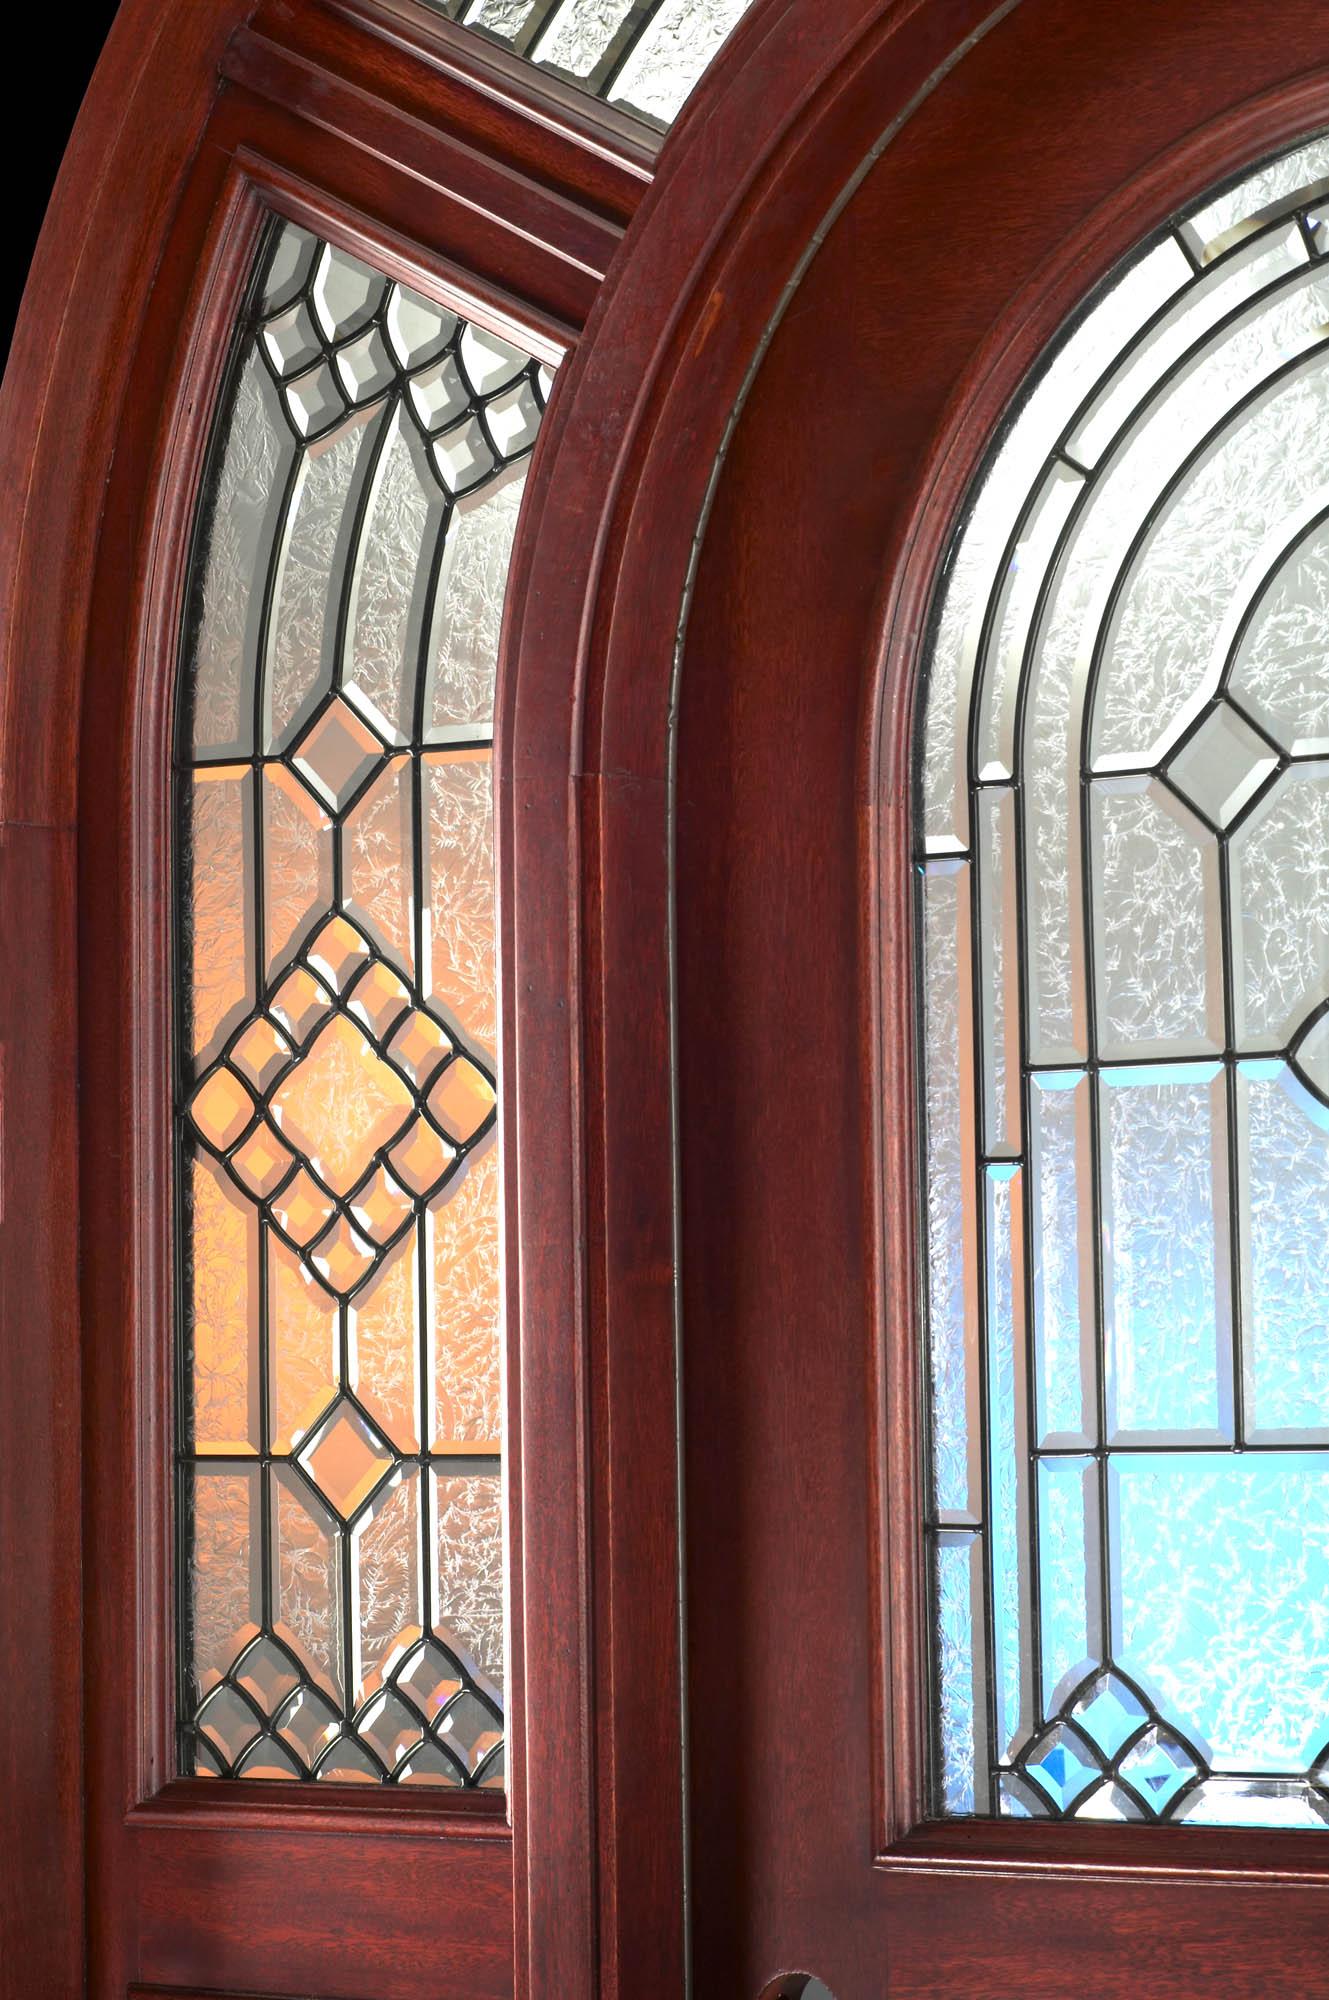 2000 #2096AB Exterior Radius Top Doors & Transom With Radius Glass wallpaper Radius Top Entry Doors 38951329